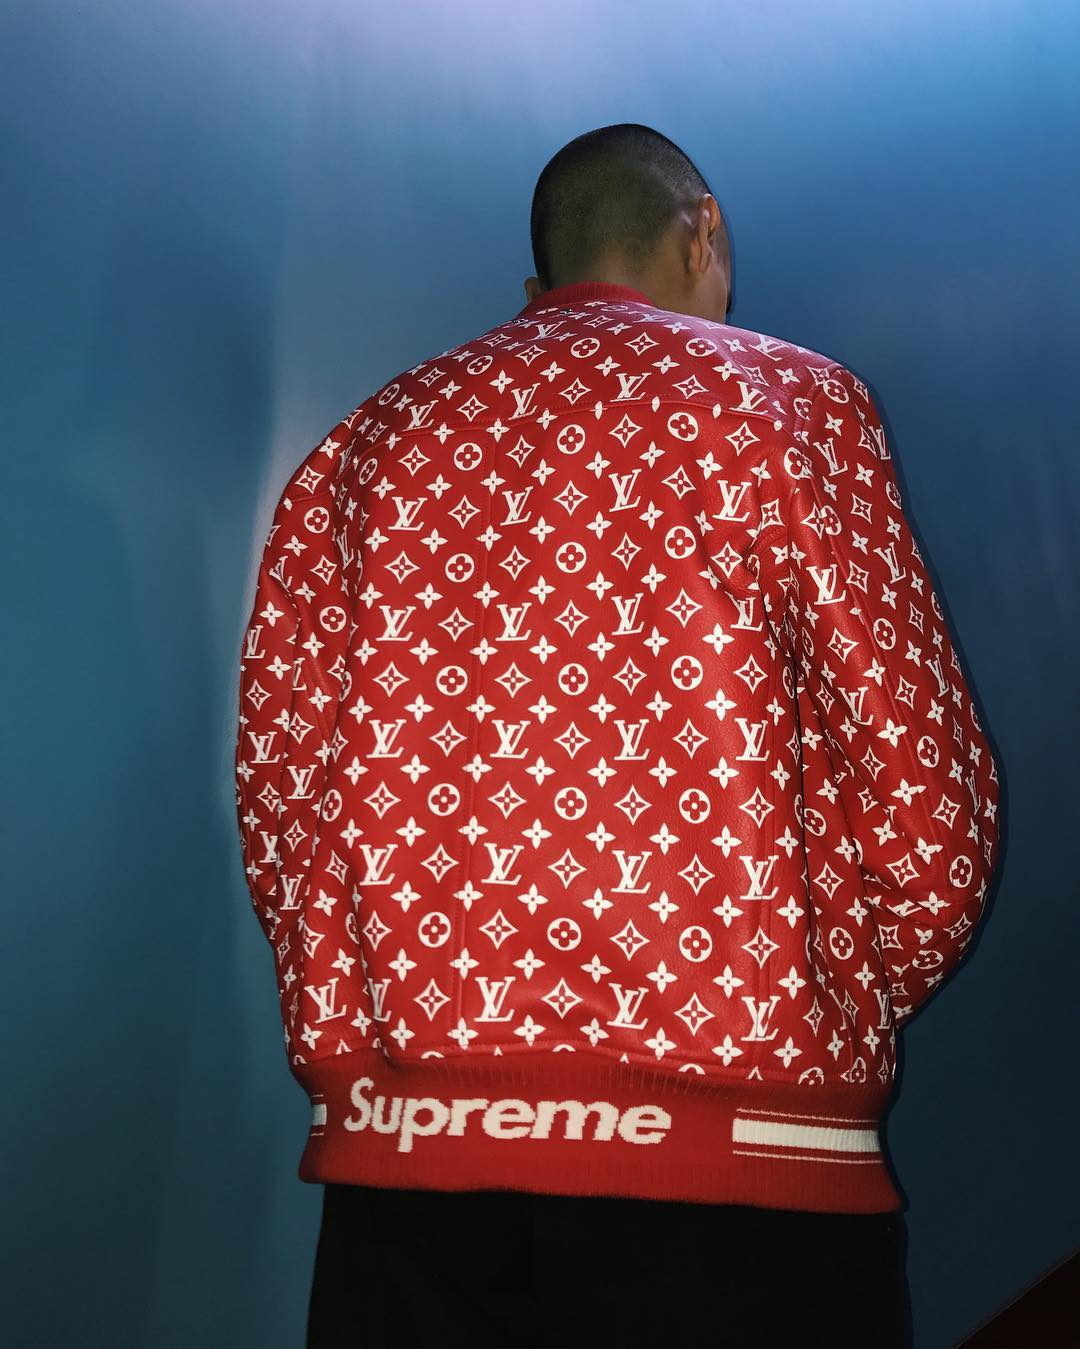 88cfa10c6be4 Louis Vuitton x Supreme - Статьи блога интернет магазина Sneakerhead